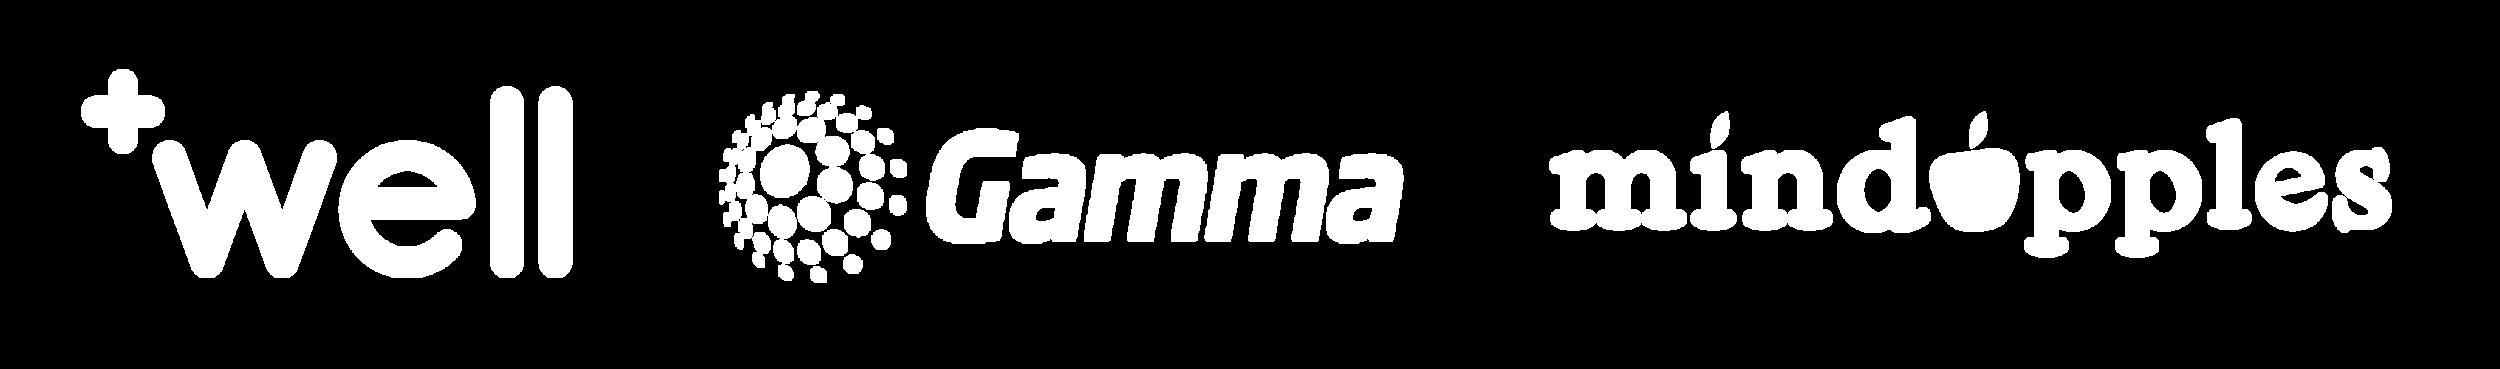 client-logos-3.png